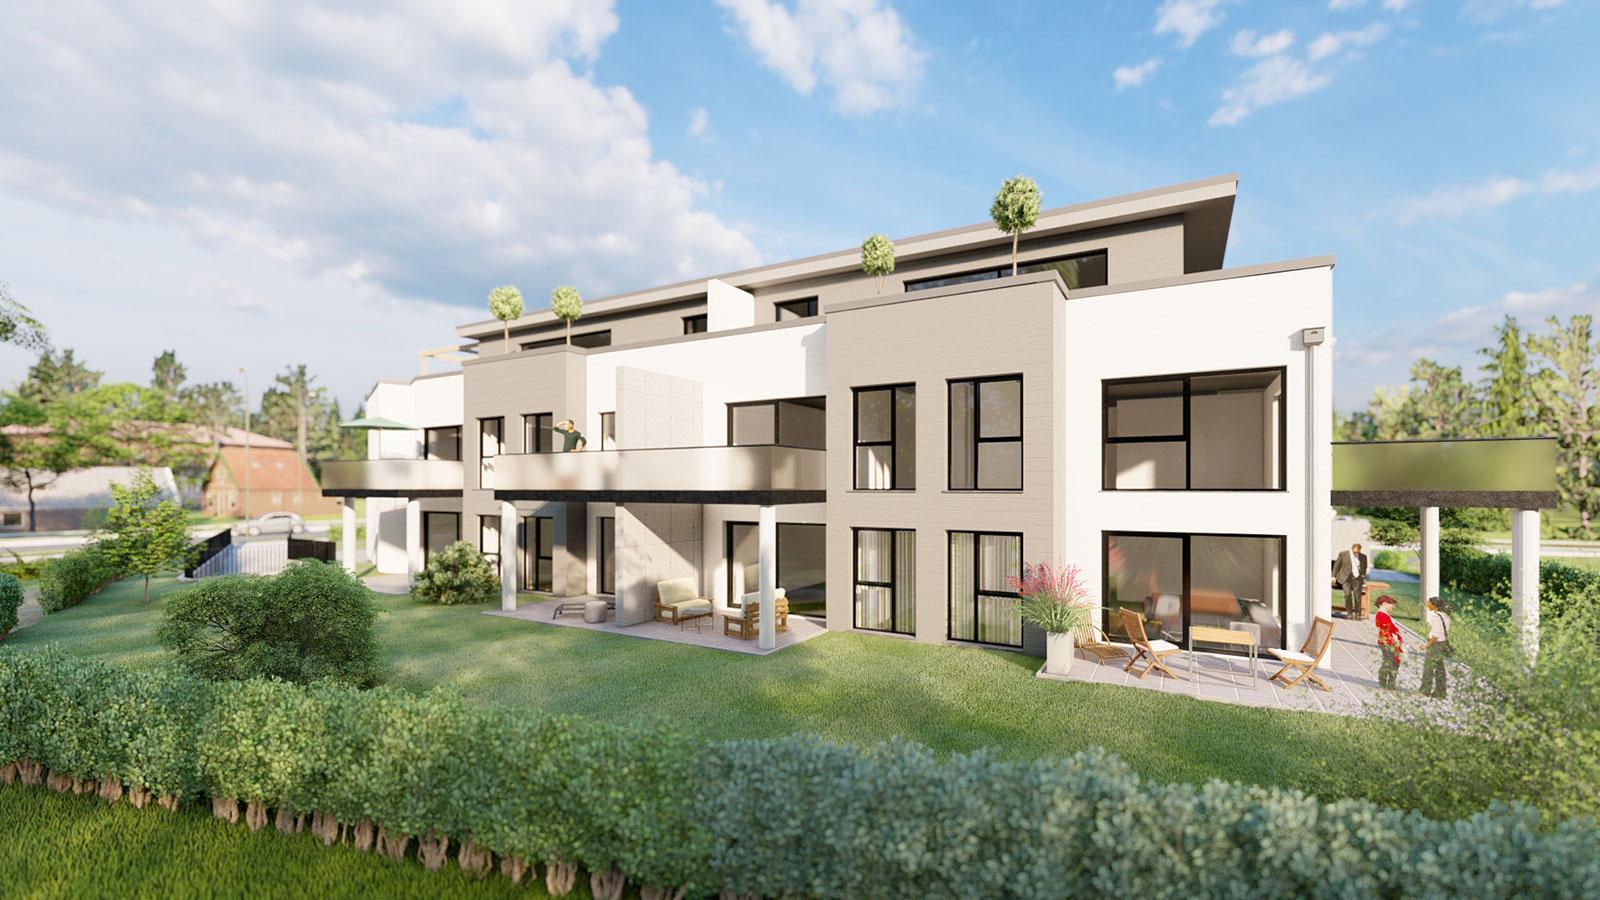 DM BauConcept GmbH - Bauprojekt Spexard